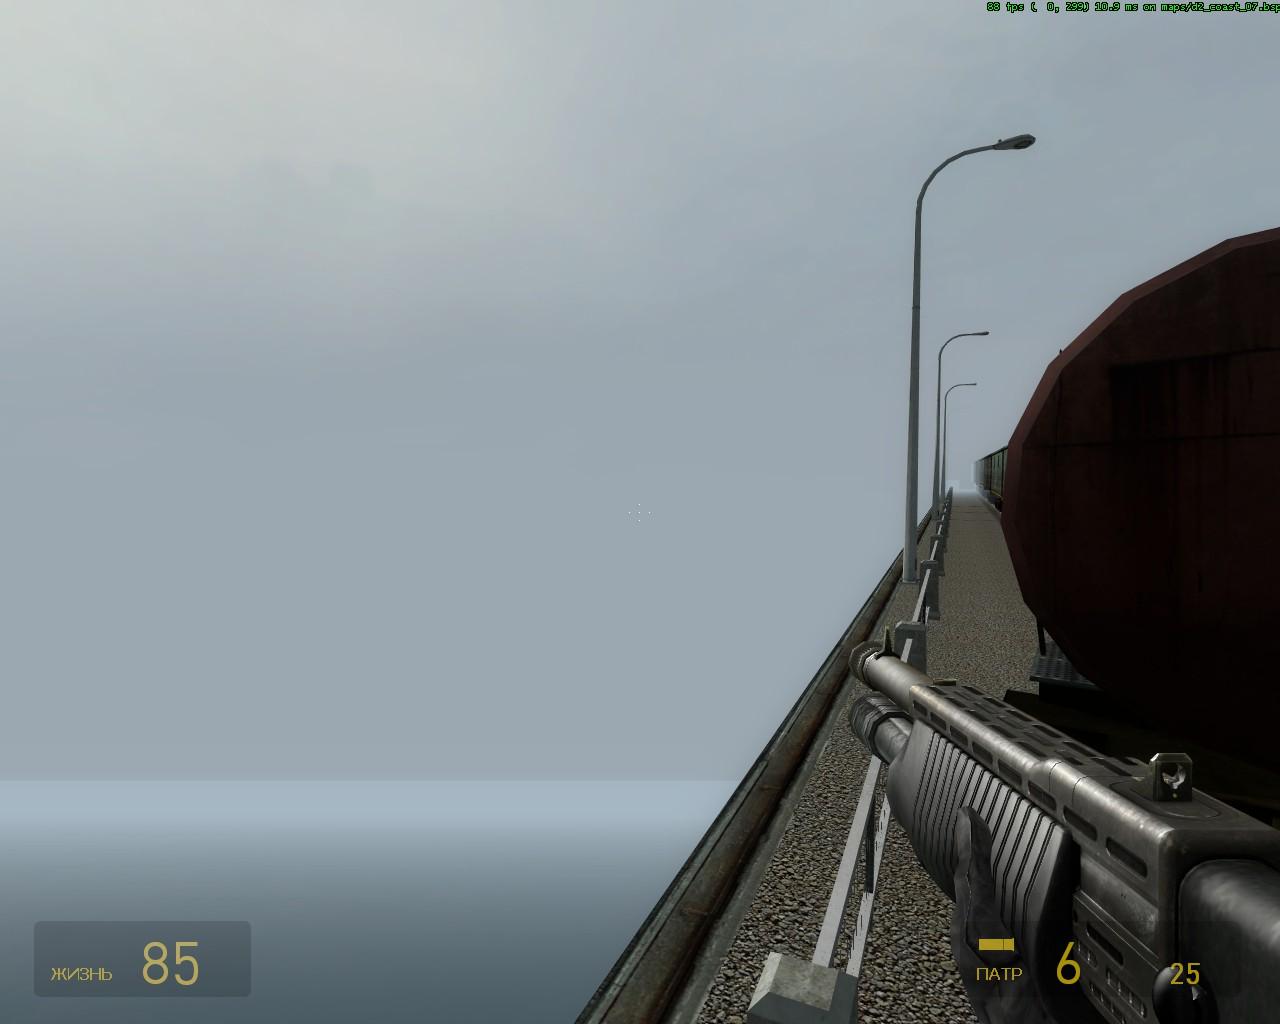 d2_coast_070001.jpg - Half-Life 2